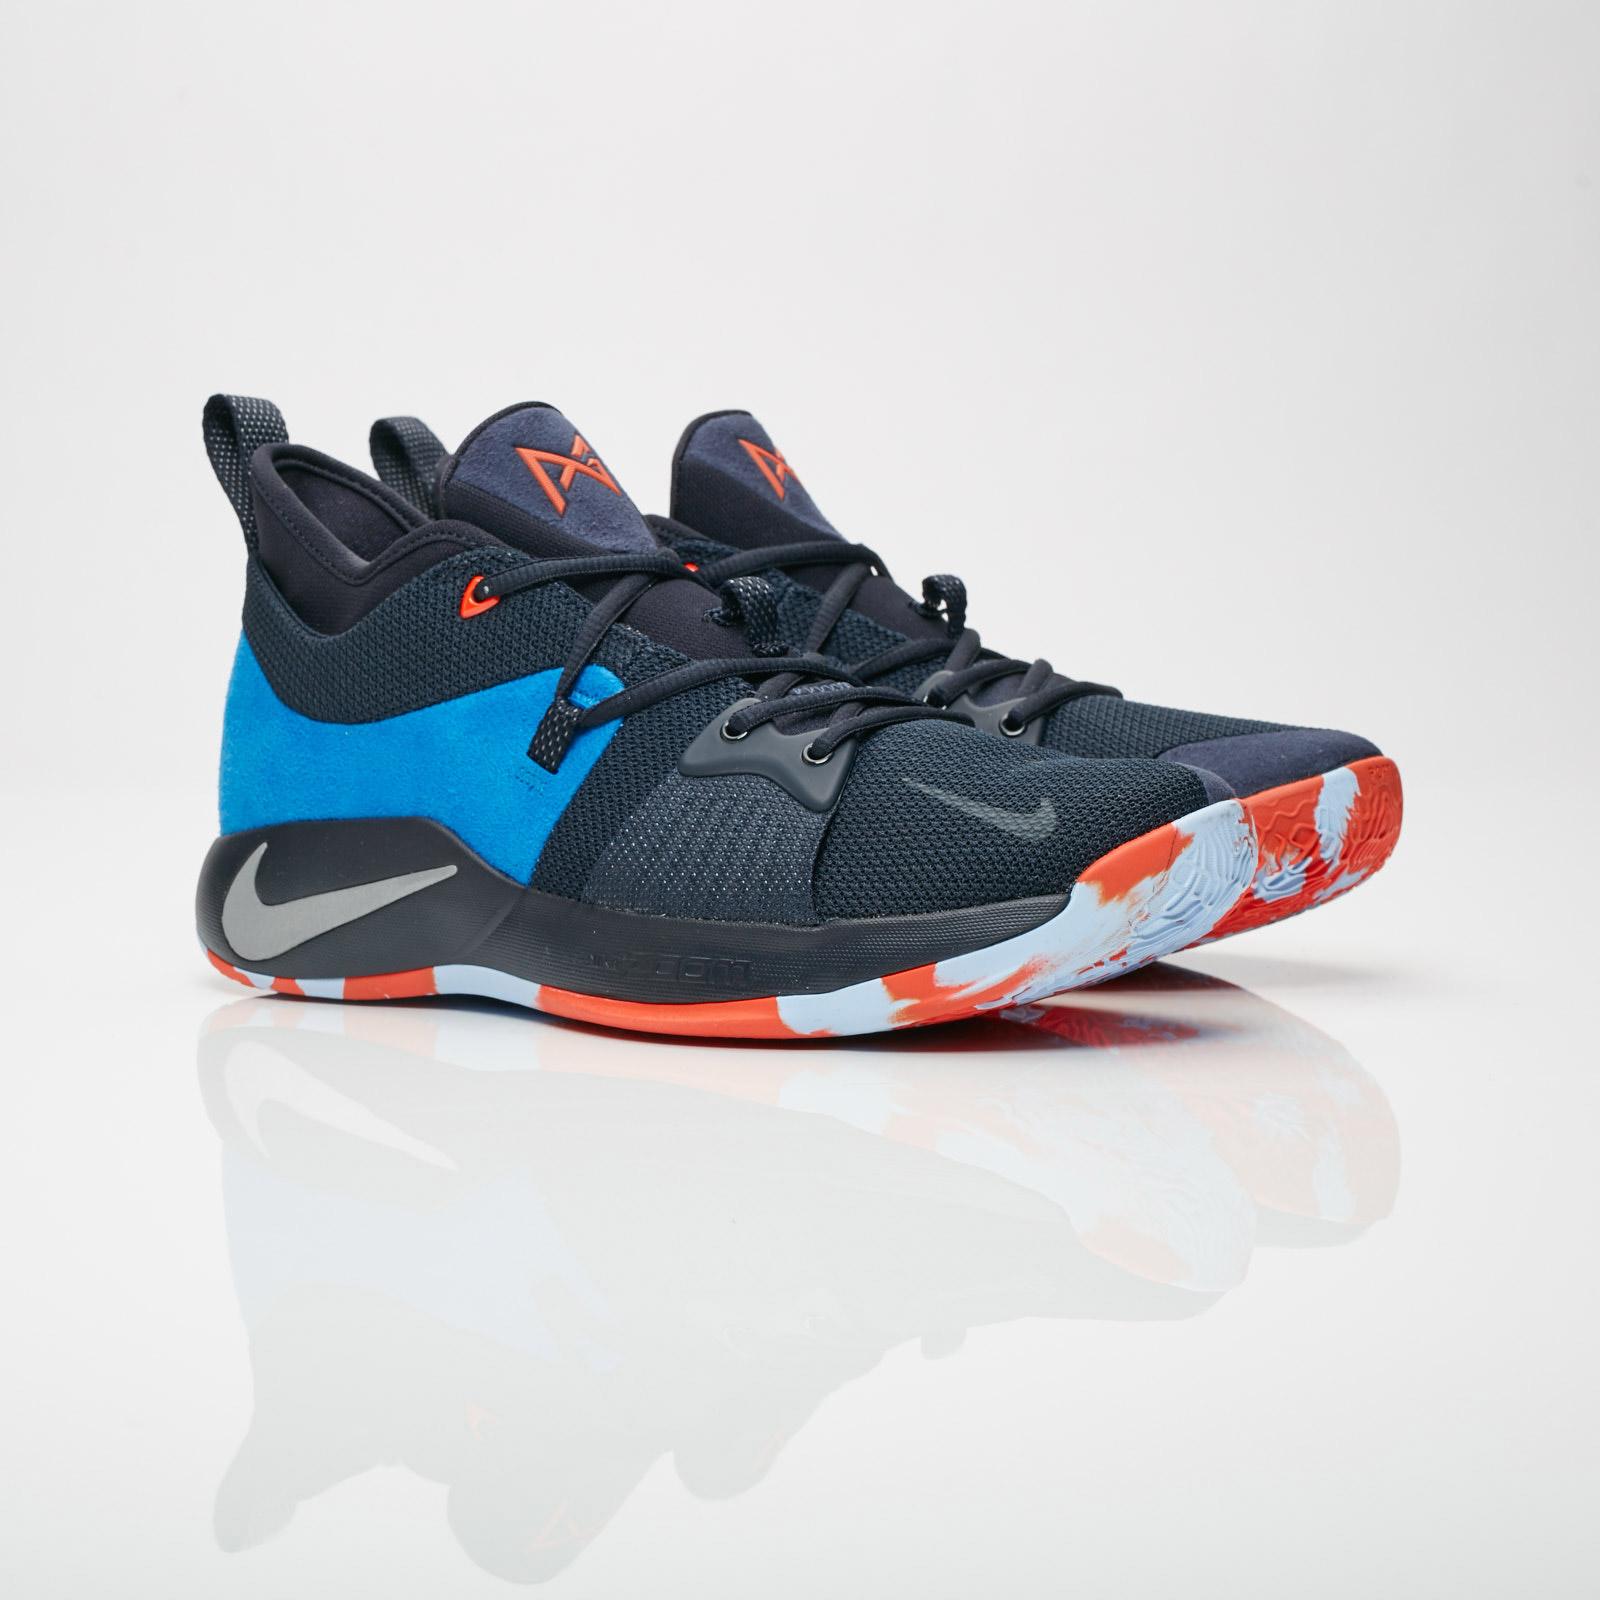 7191a05edf4 Nike PG 2 - Aj2039-400 - Sneakersnstuff